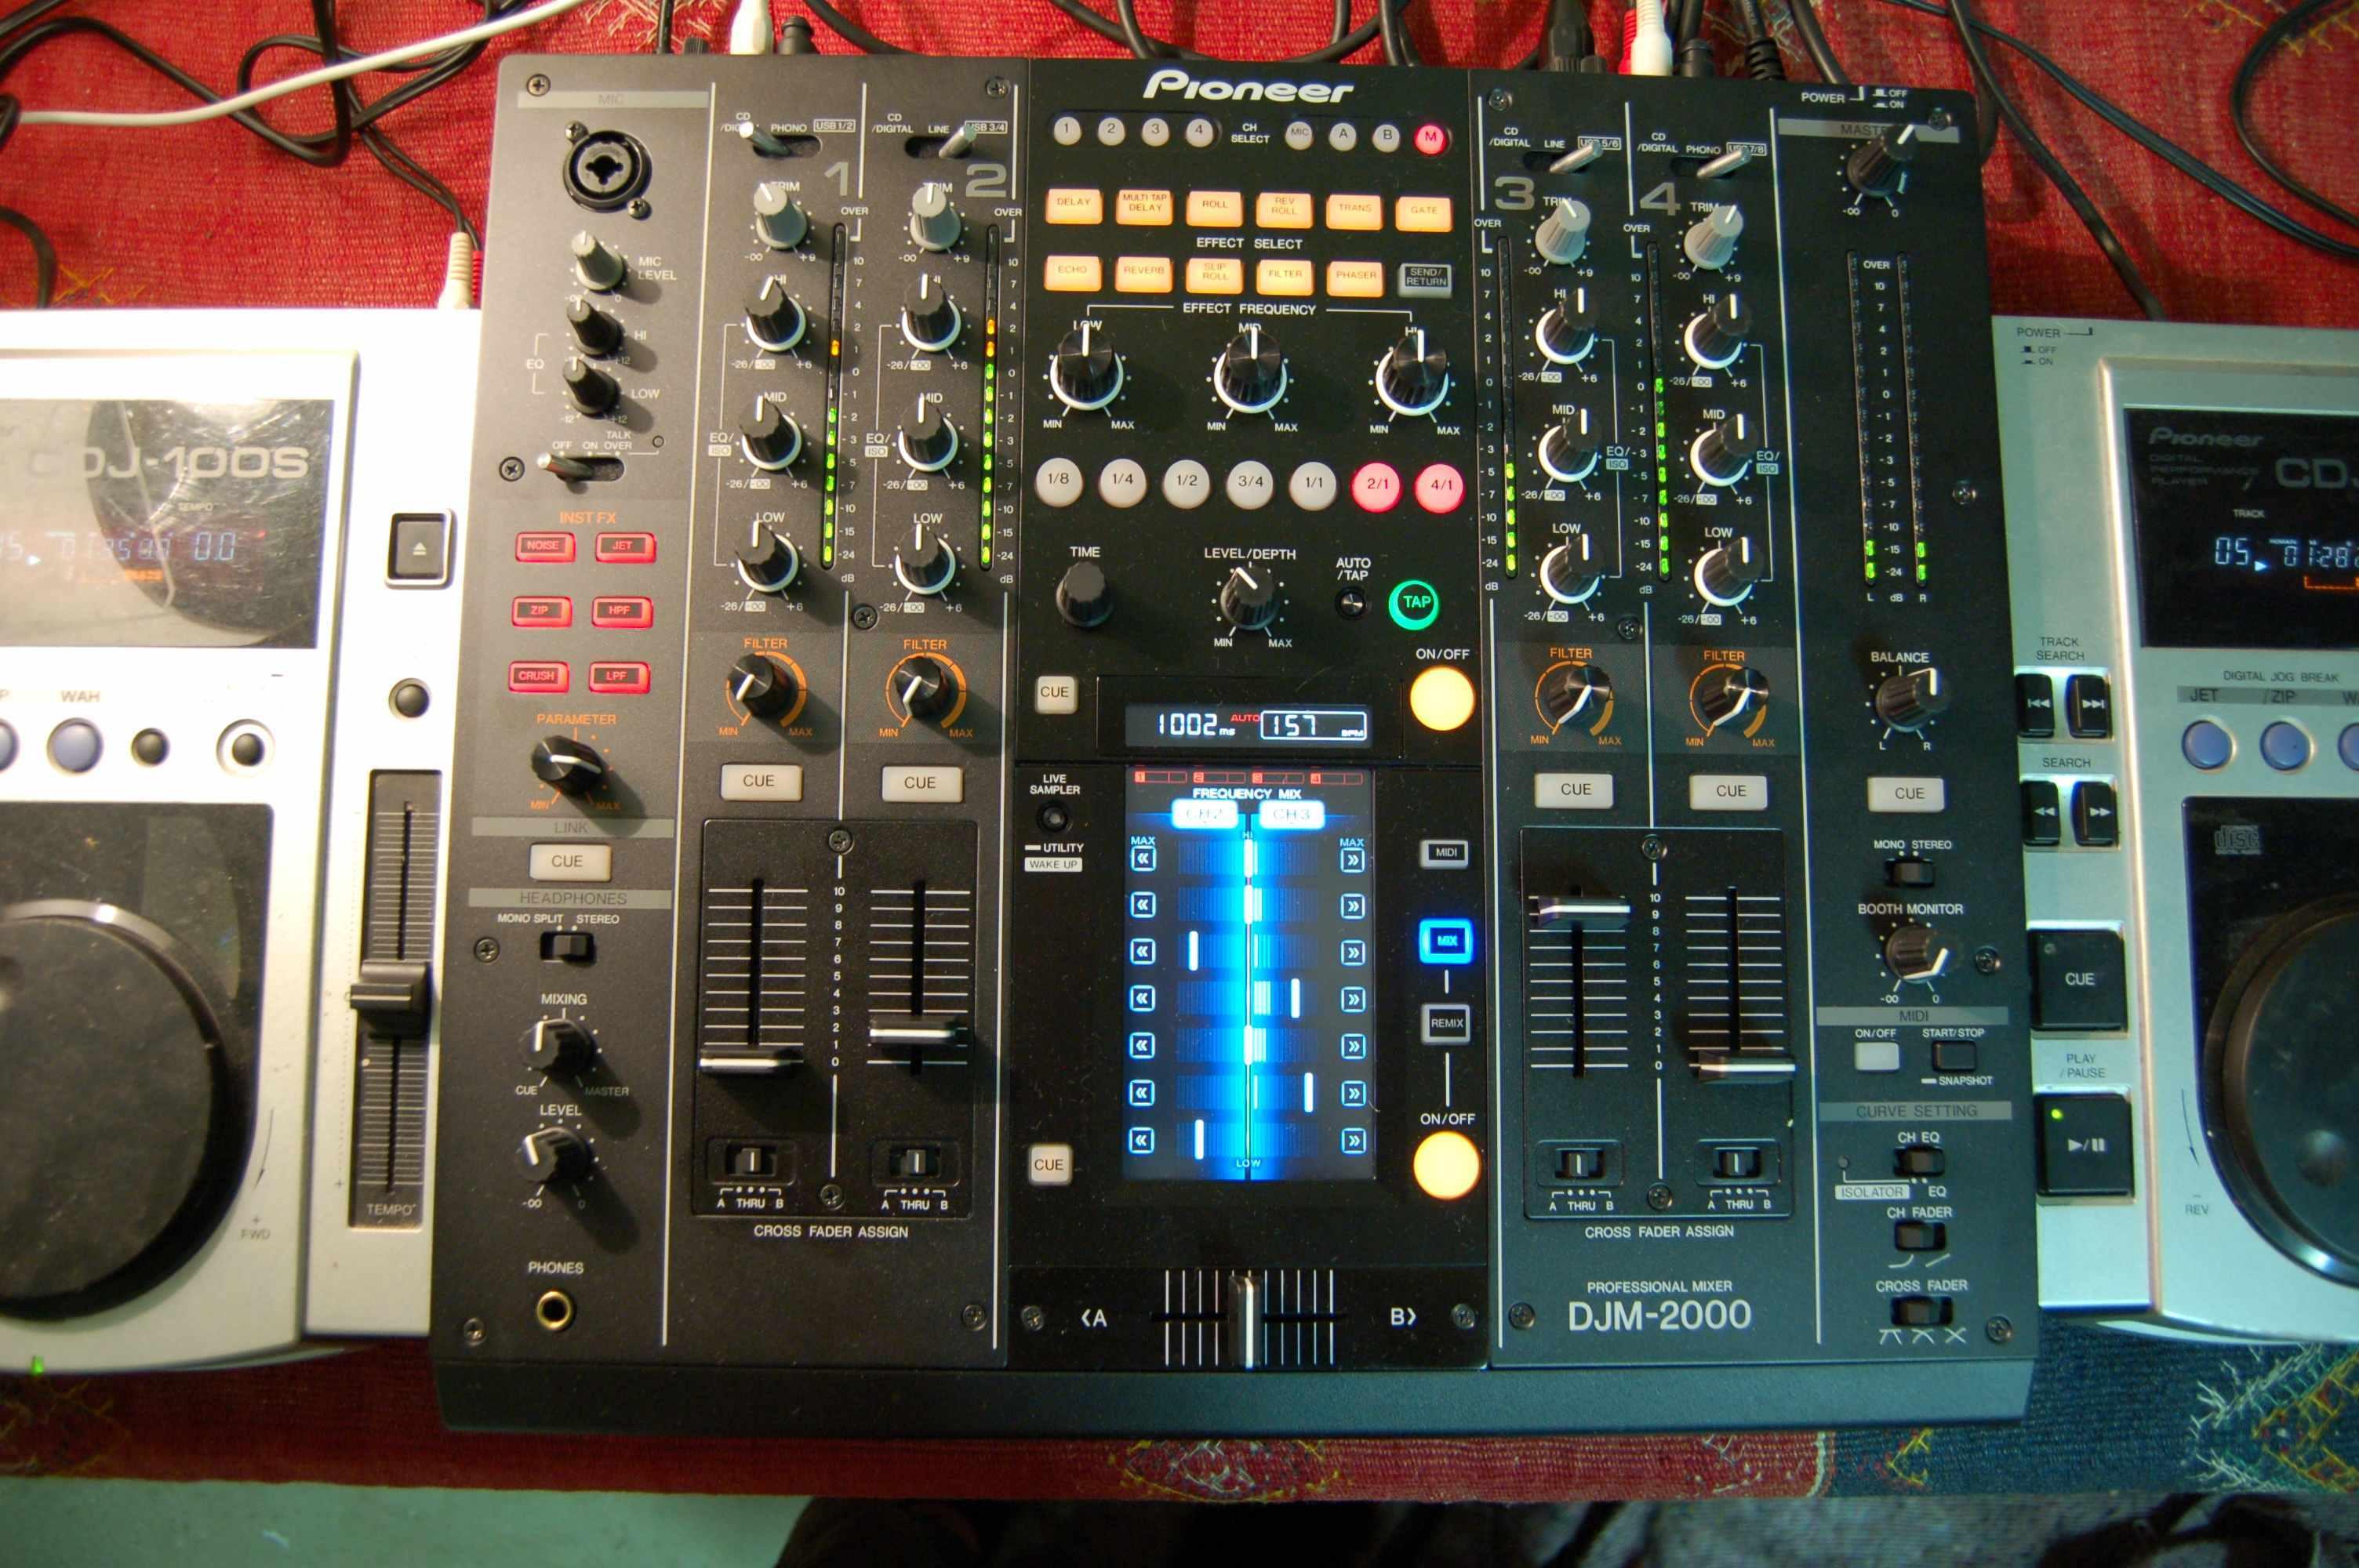 Achat occasion pioneer djm 2000 france audiofanzine - Table de mixage pioneer occasion ...